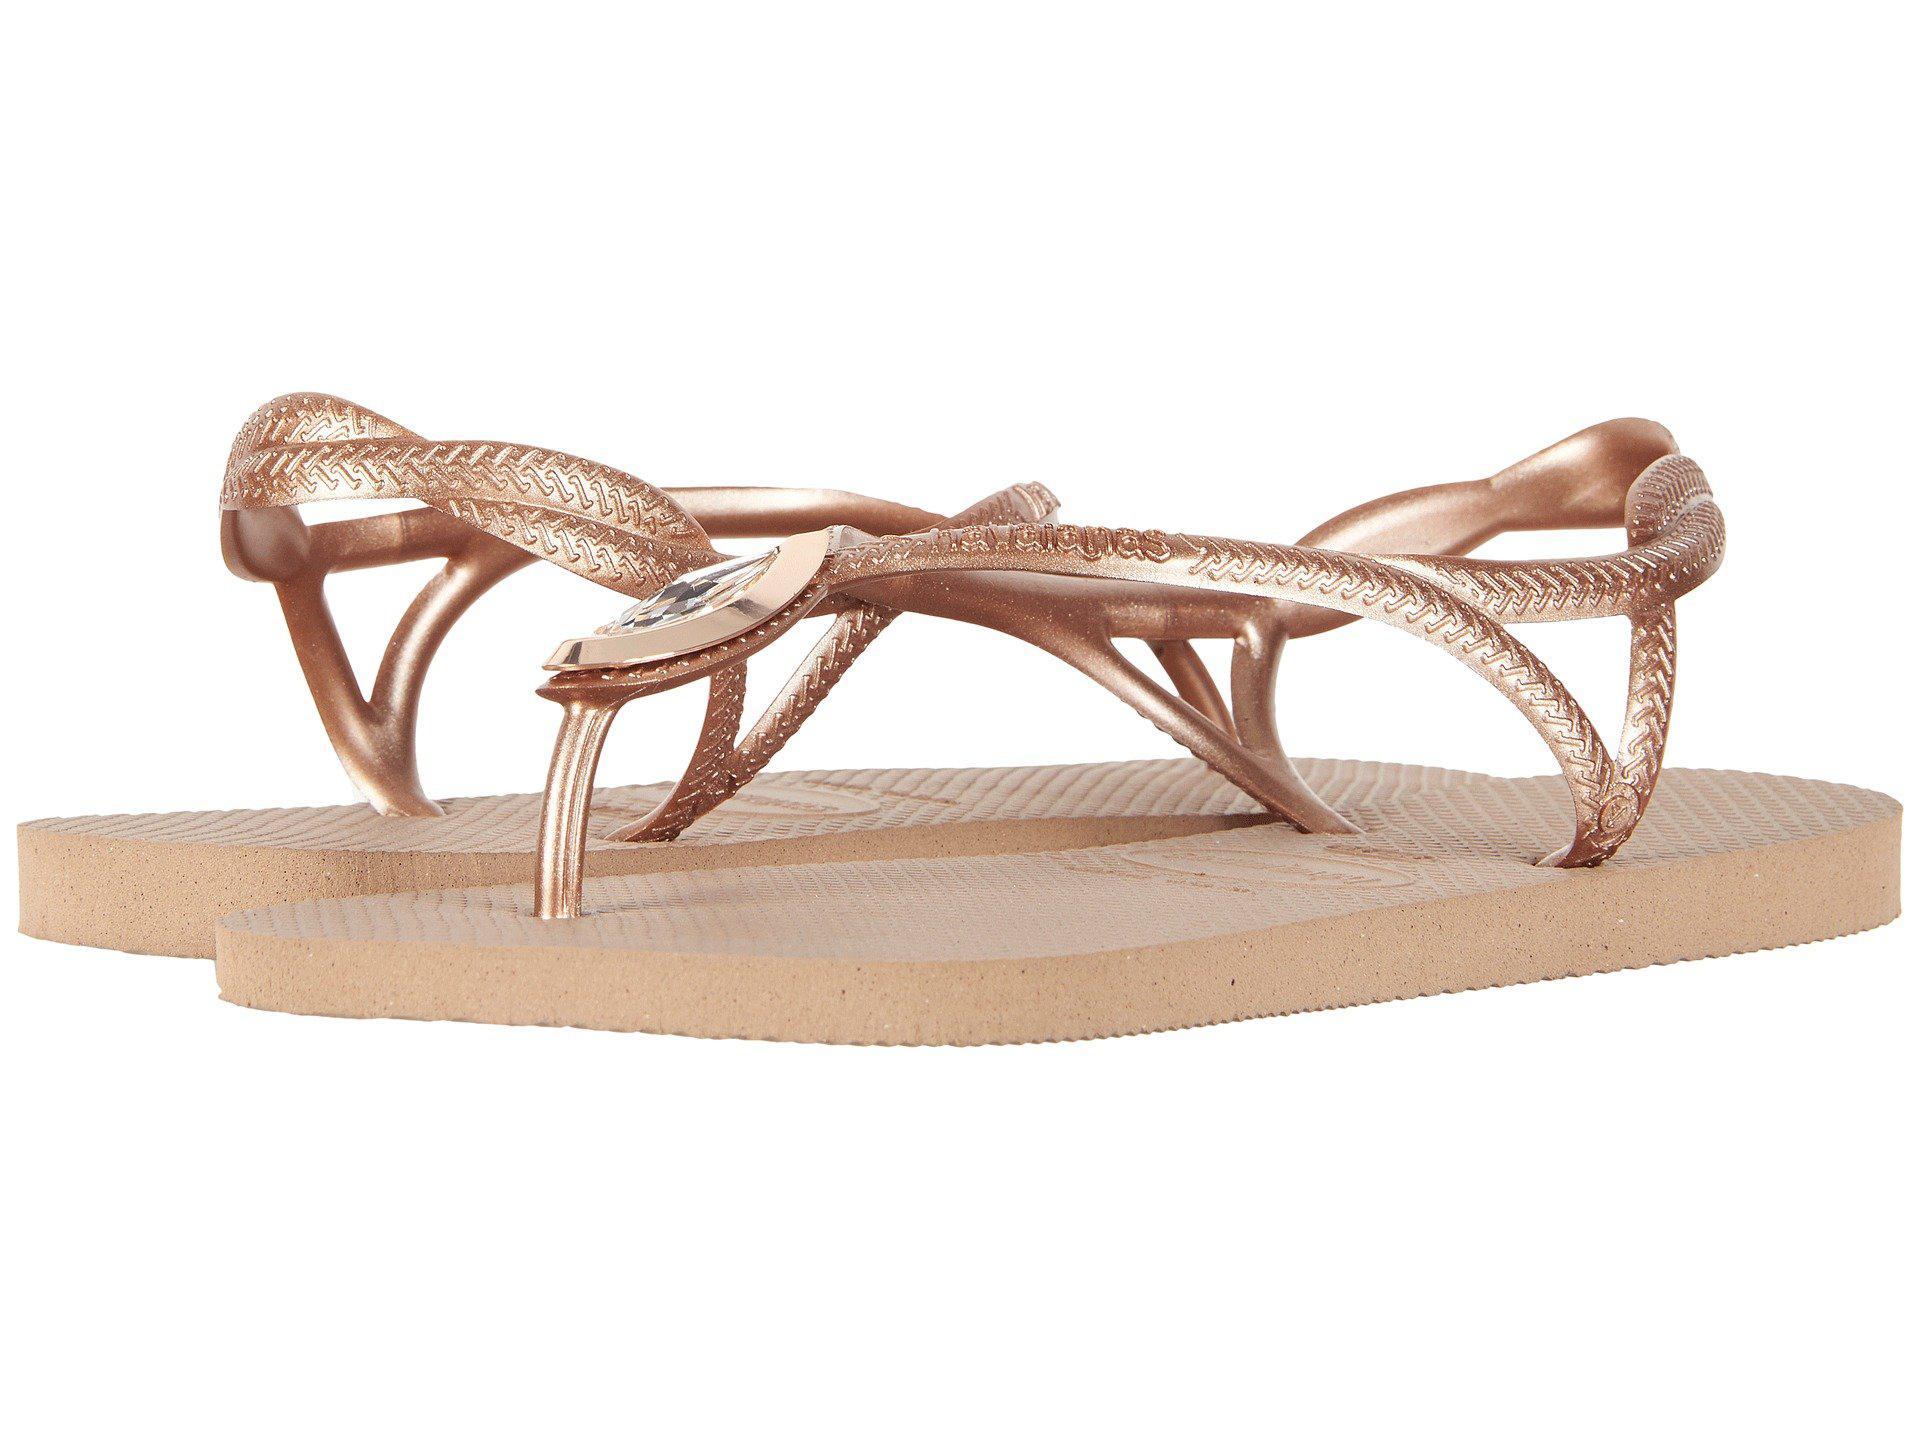 5c65e7319e1c Lyst - Havaianas Luna Special Sandals